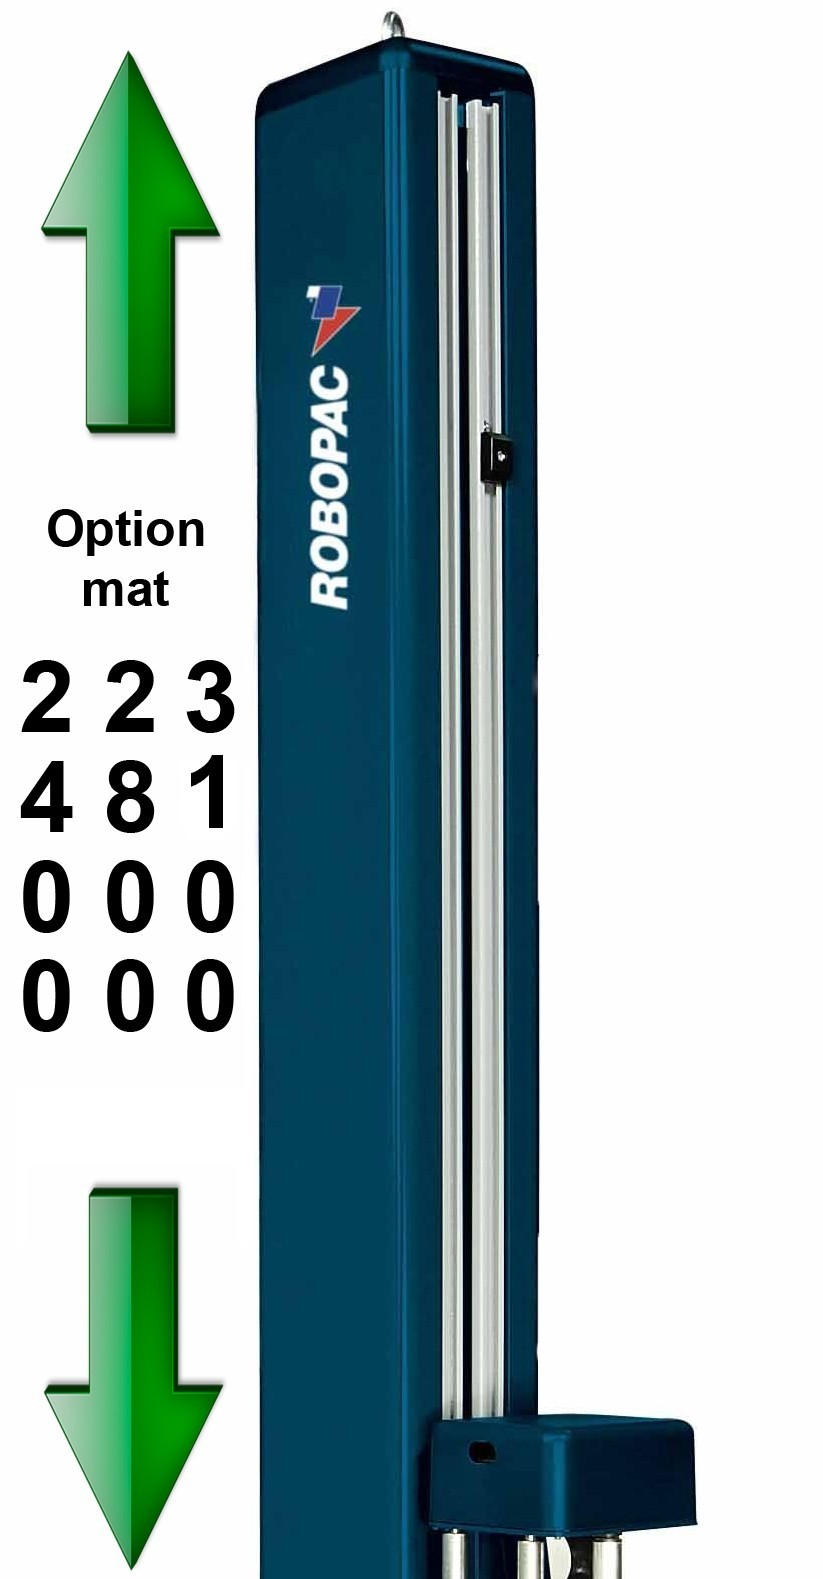 FILMEUSE-708-PVS option hauteur mat